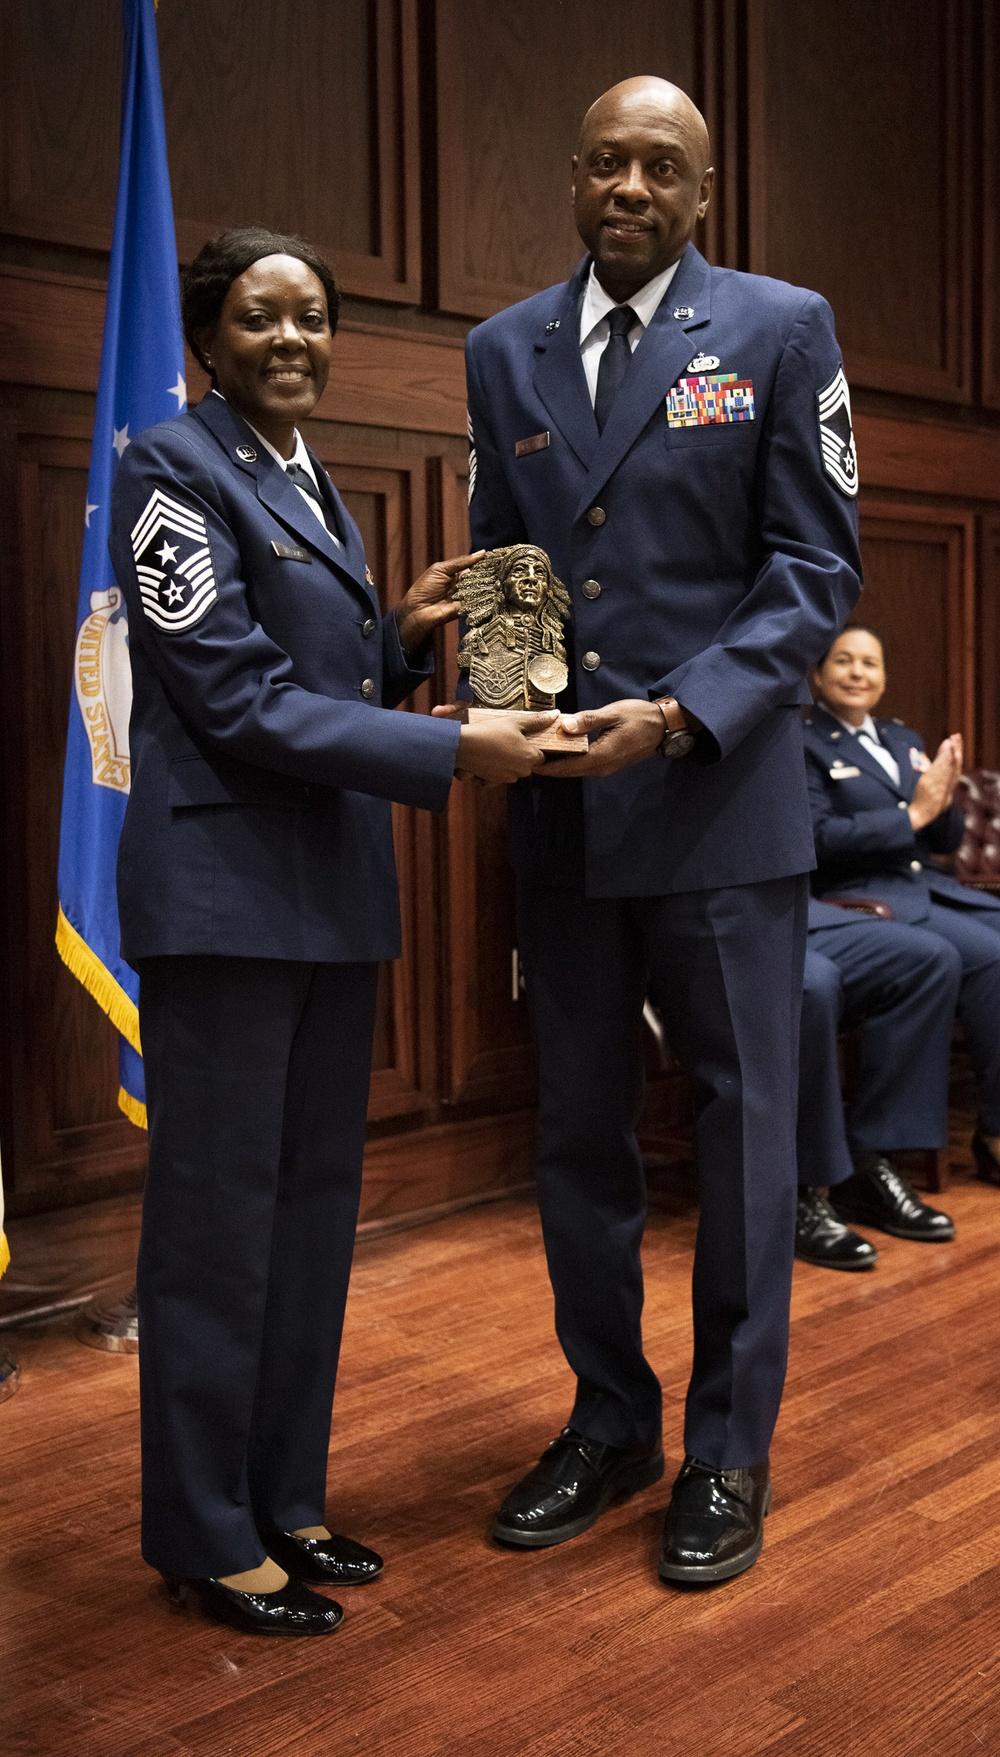 Chief Mathews celebrates Induction To Chief Master Sergeant